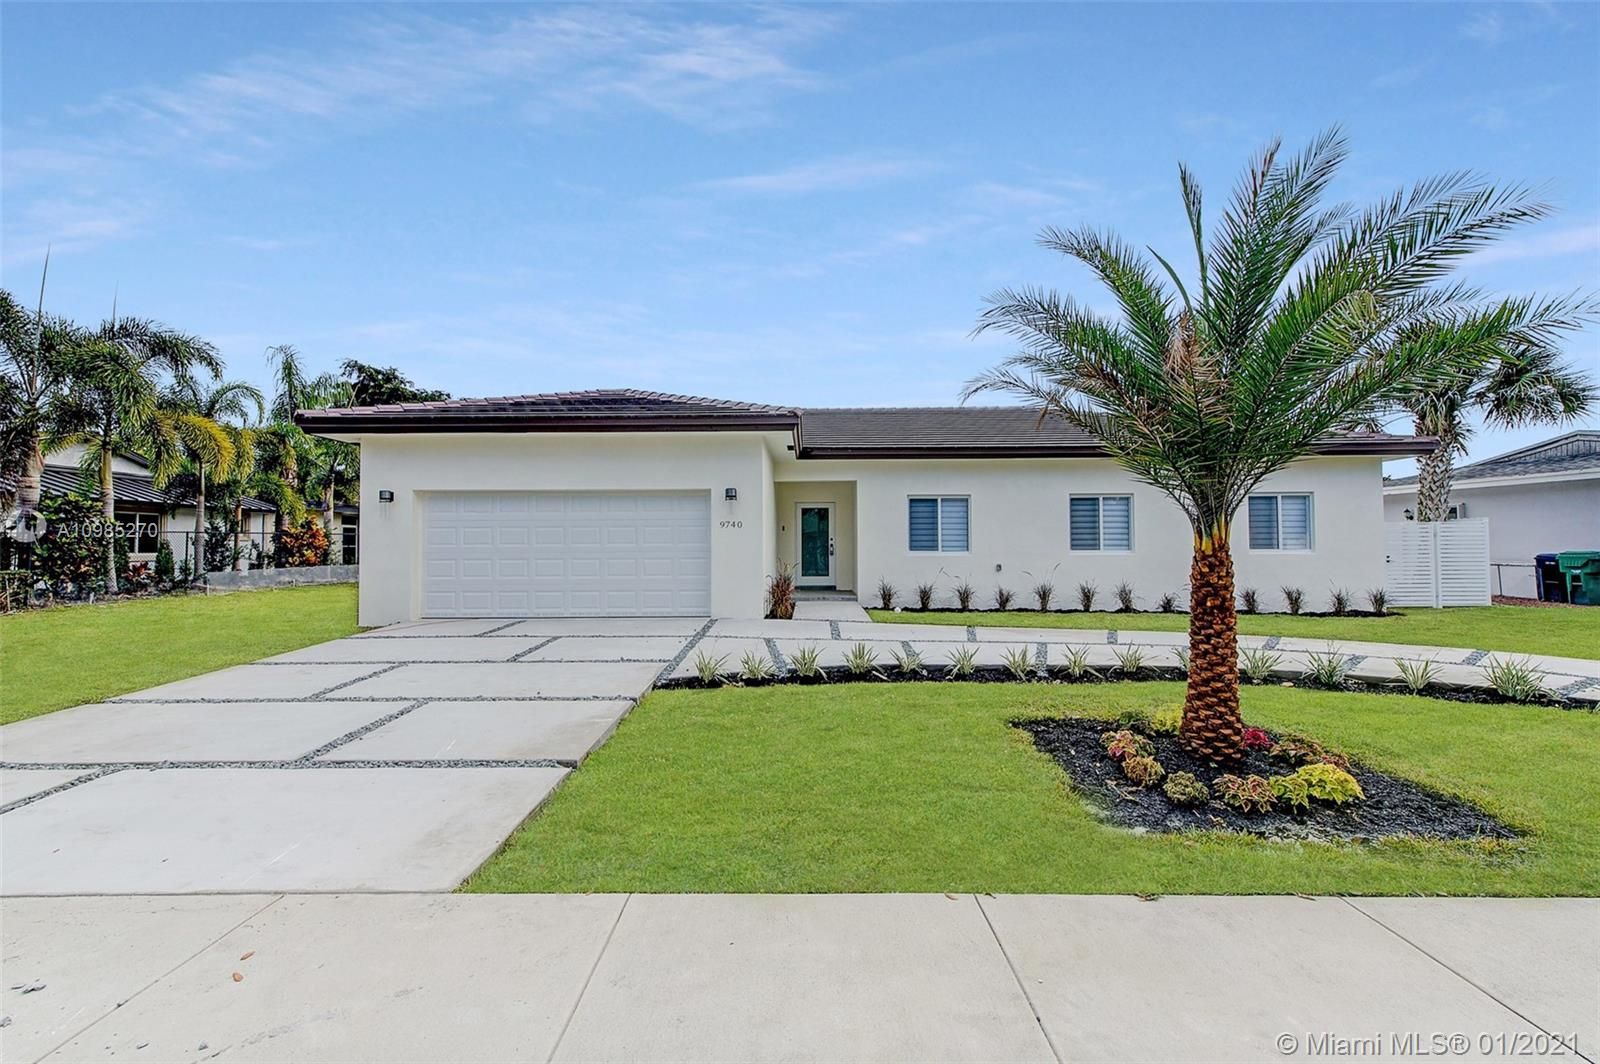 9740 W Palmetto Club Ln, Miami, Florida 33157, 4 Bedrooms Bedrooms, ,3 BathroomsBathrooms,Residential,For Sale,9740 W Palmetto Club Ln,A10985270